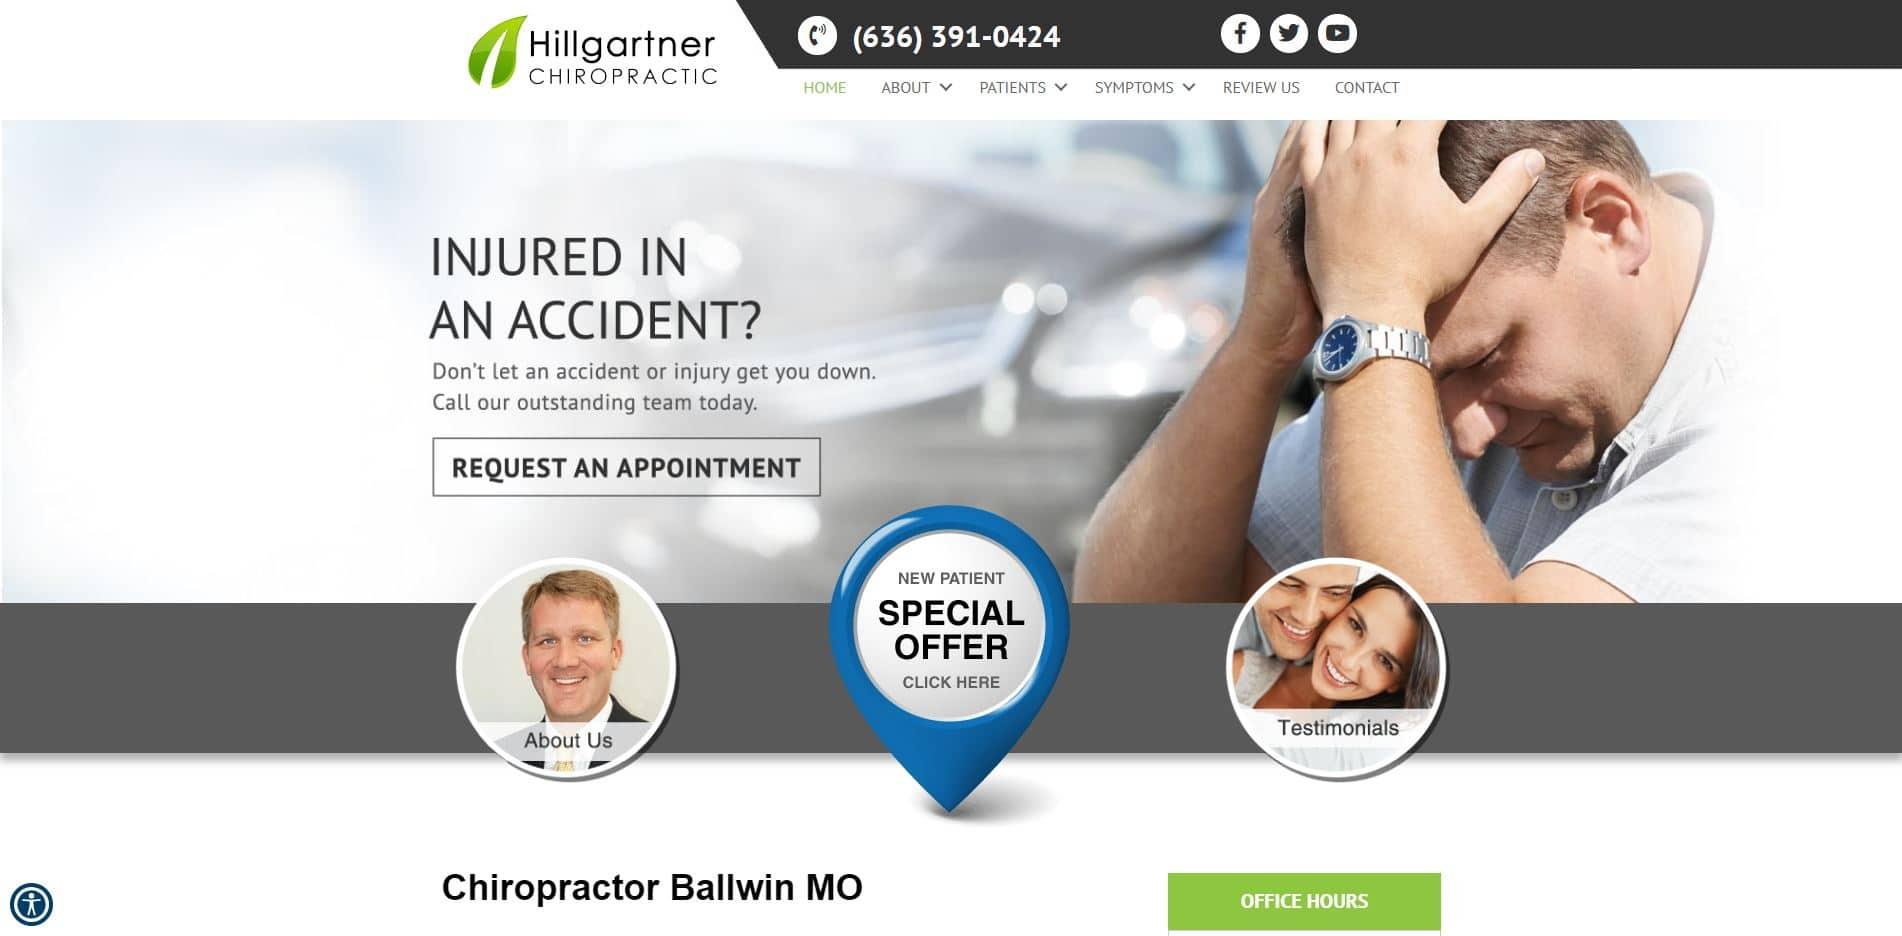 Chiropractor in Ballwin